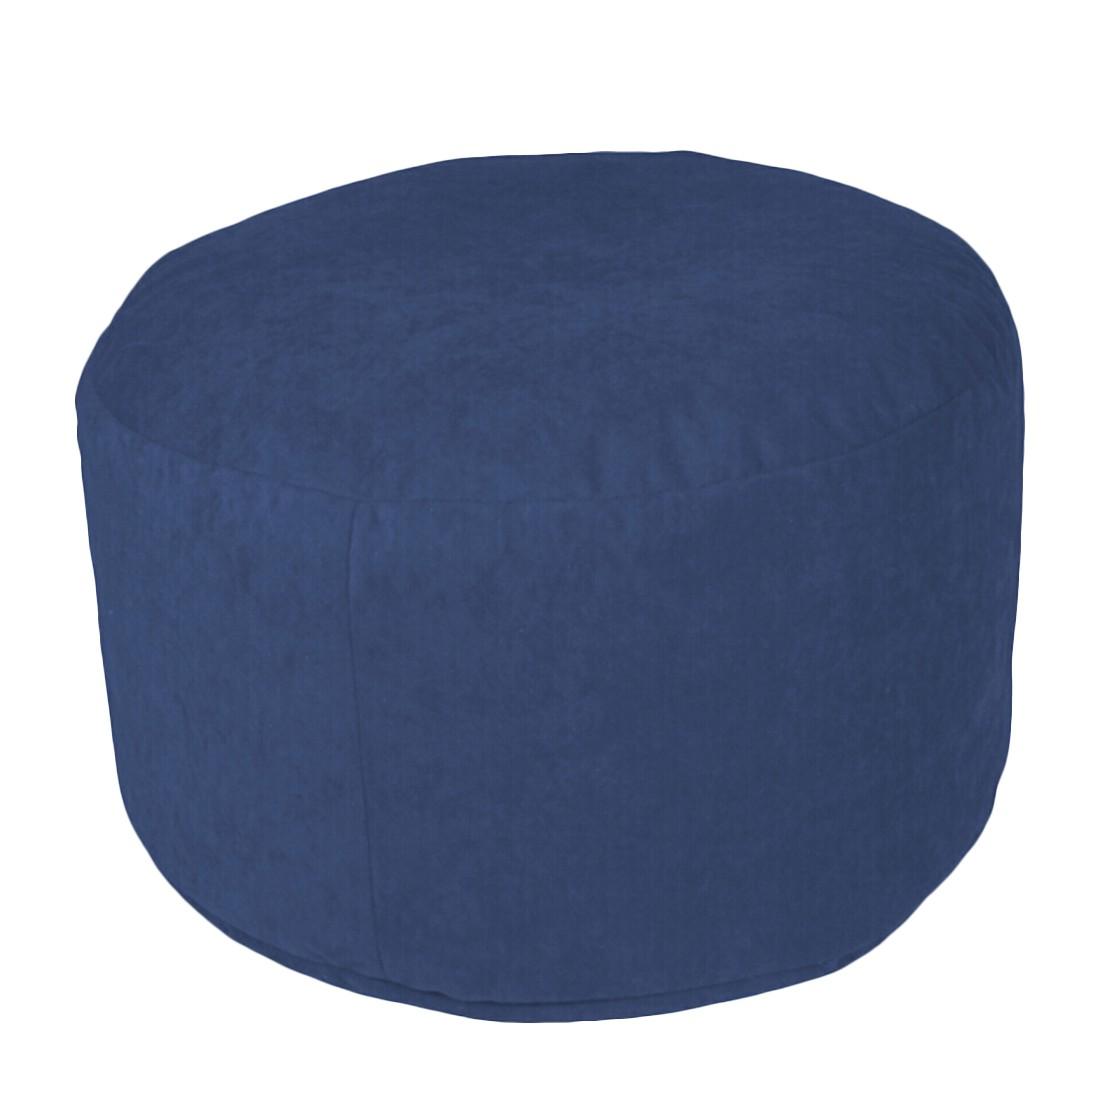 Pouf Microvelour Blau groß – 47 x 47 cm, KC-Handel günstig bestellen